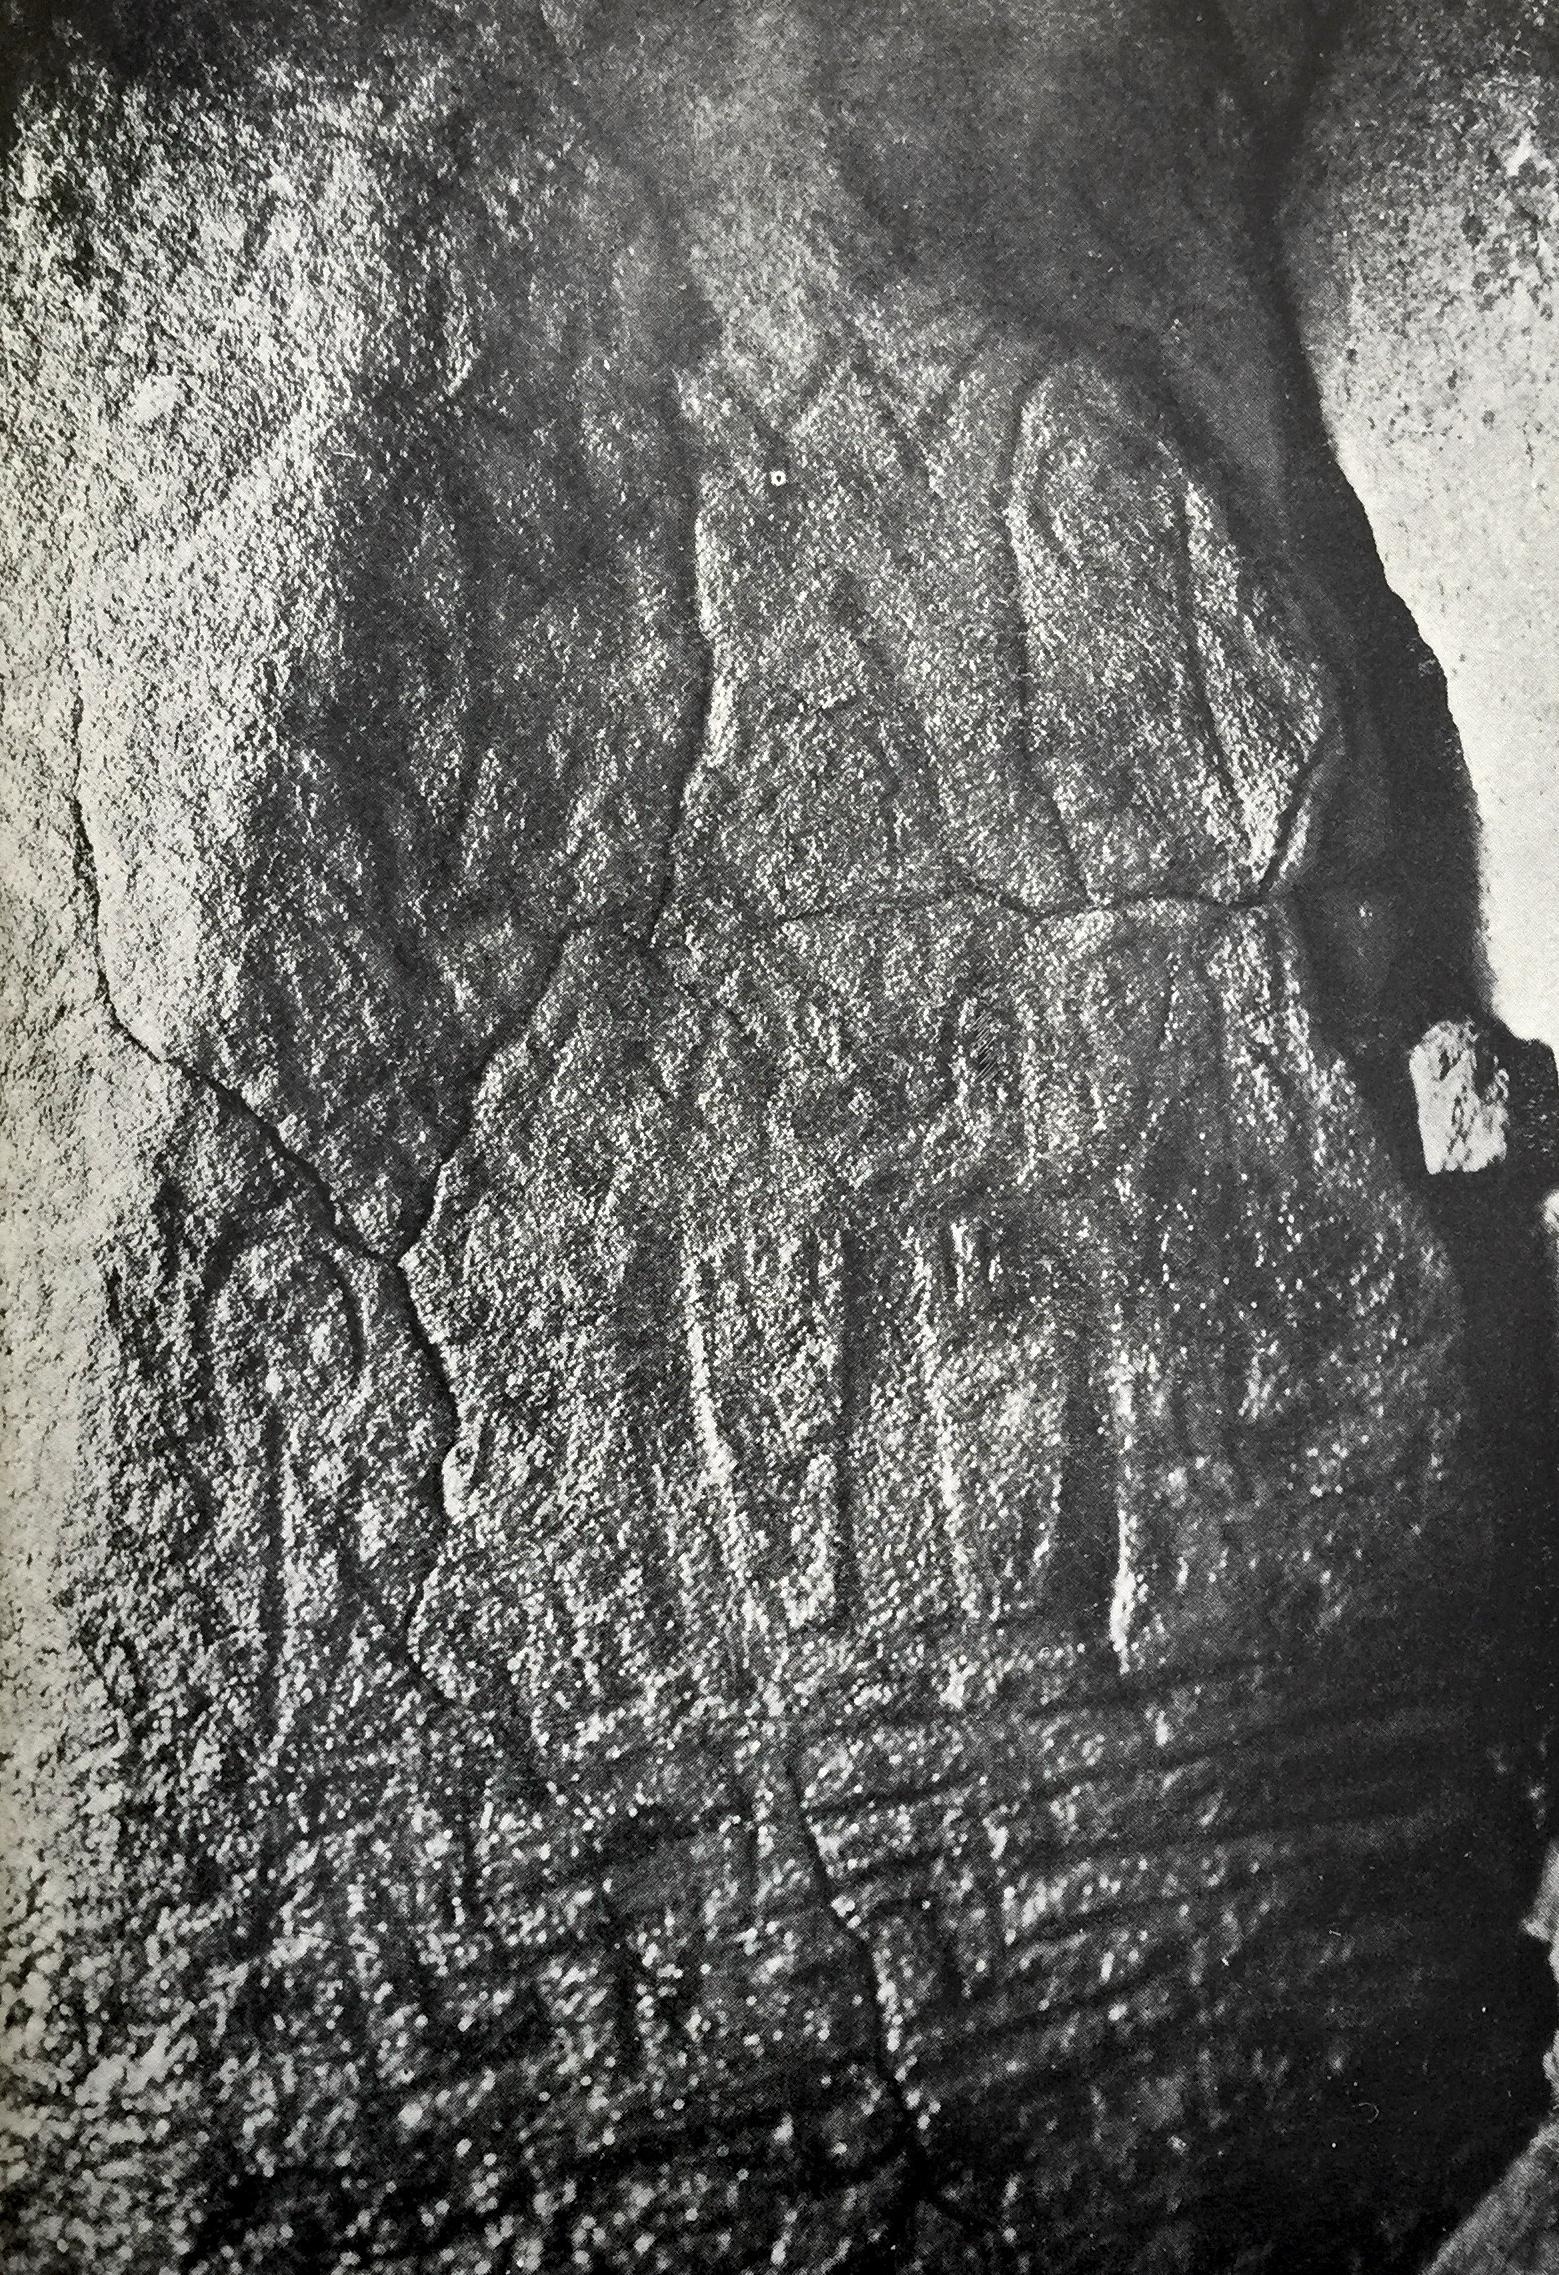 Plate 77 from Péquart & Le Rouzic 1927, showing the twin feet motif on stone 8 at Dolmen du Petit-Mont.